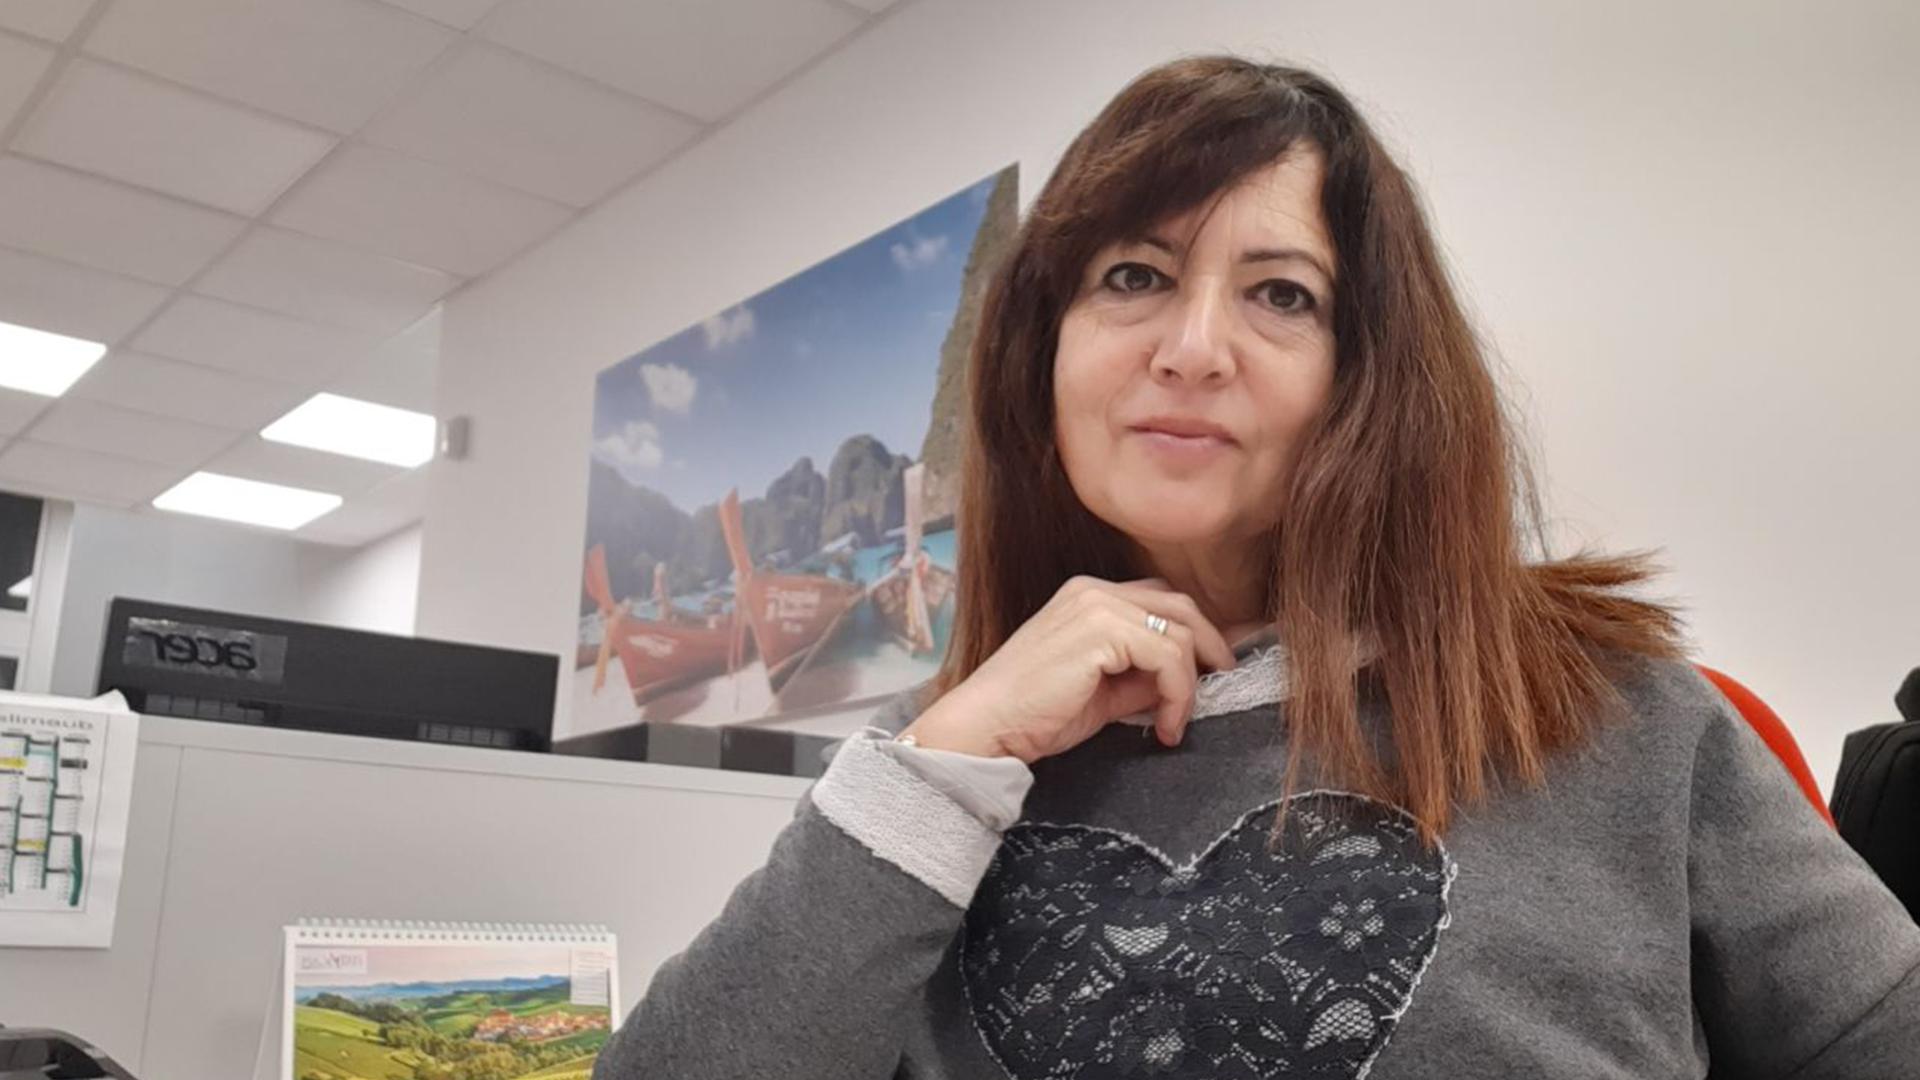 Nadia Papini